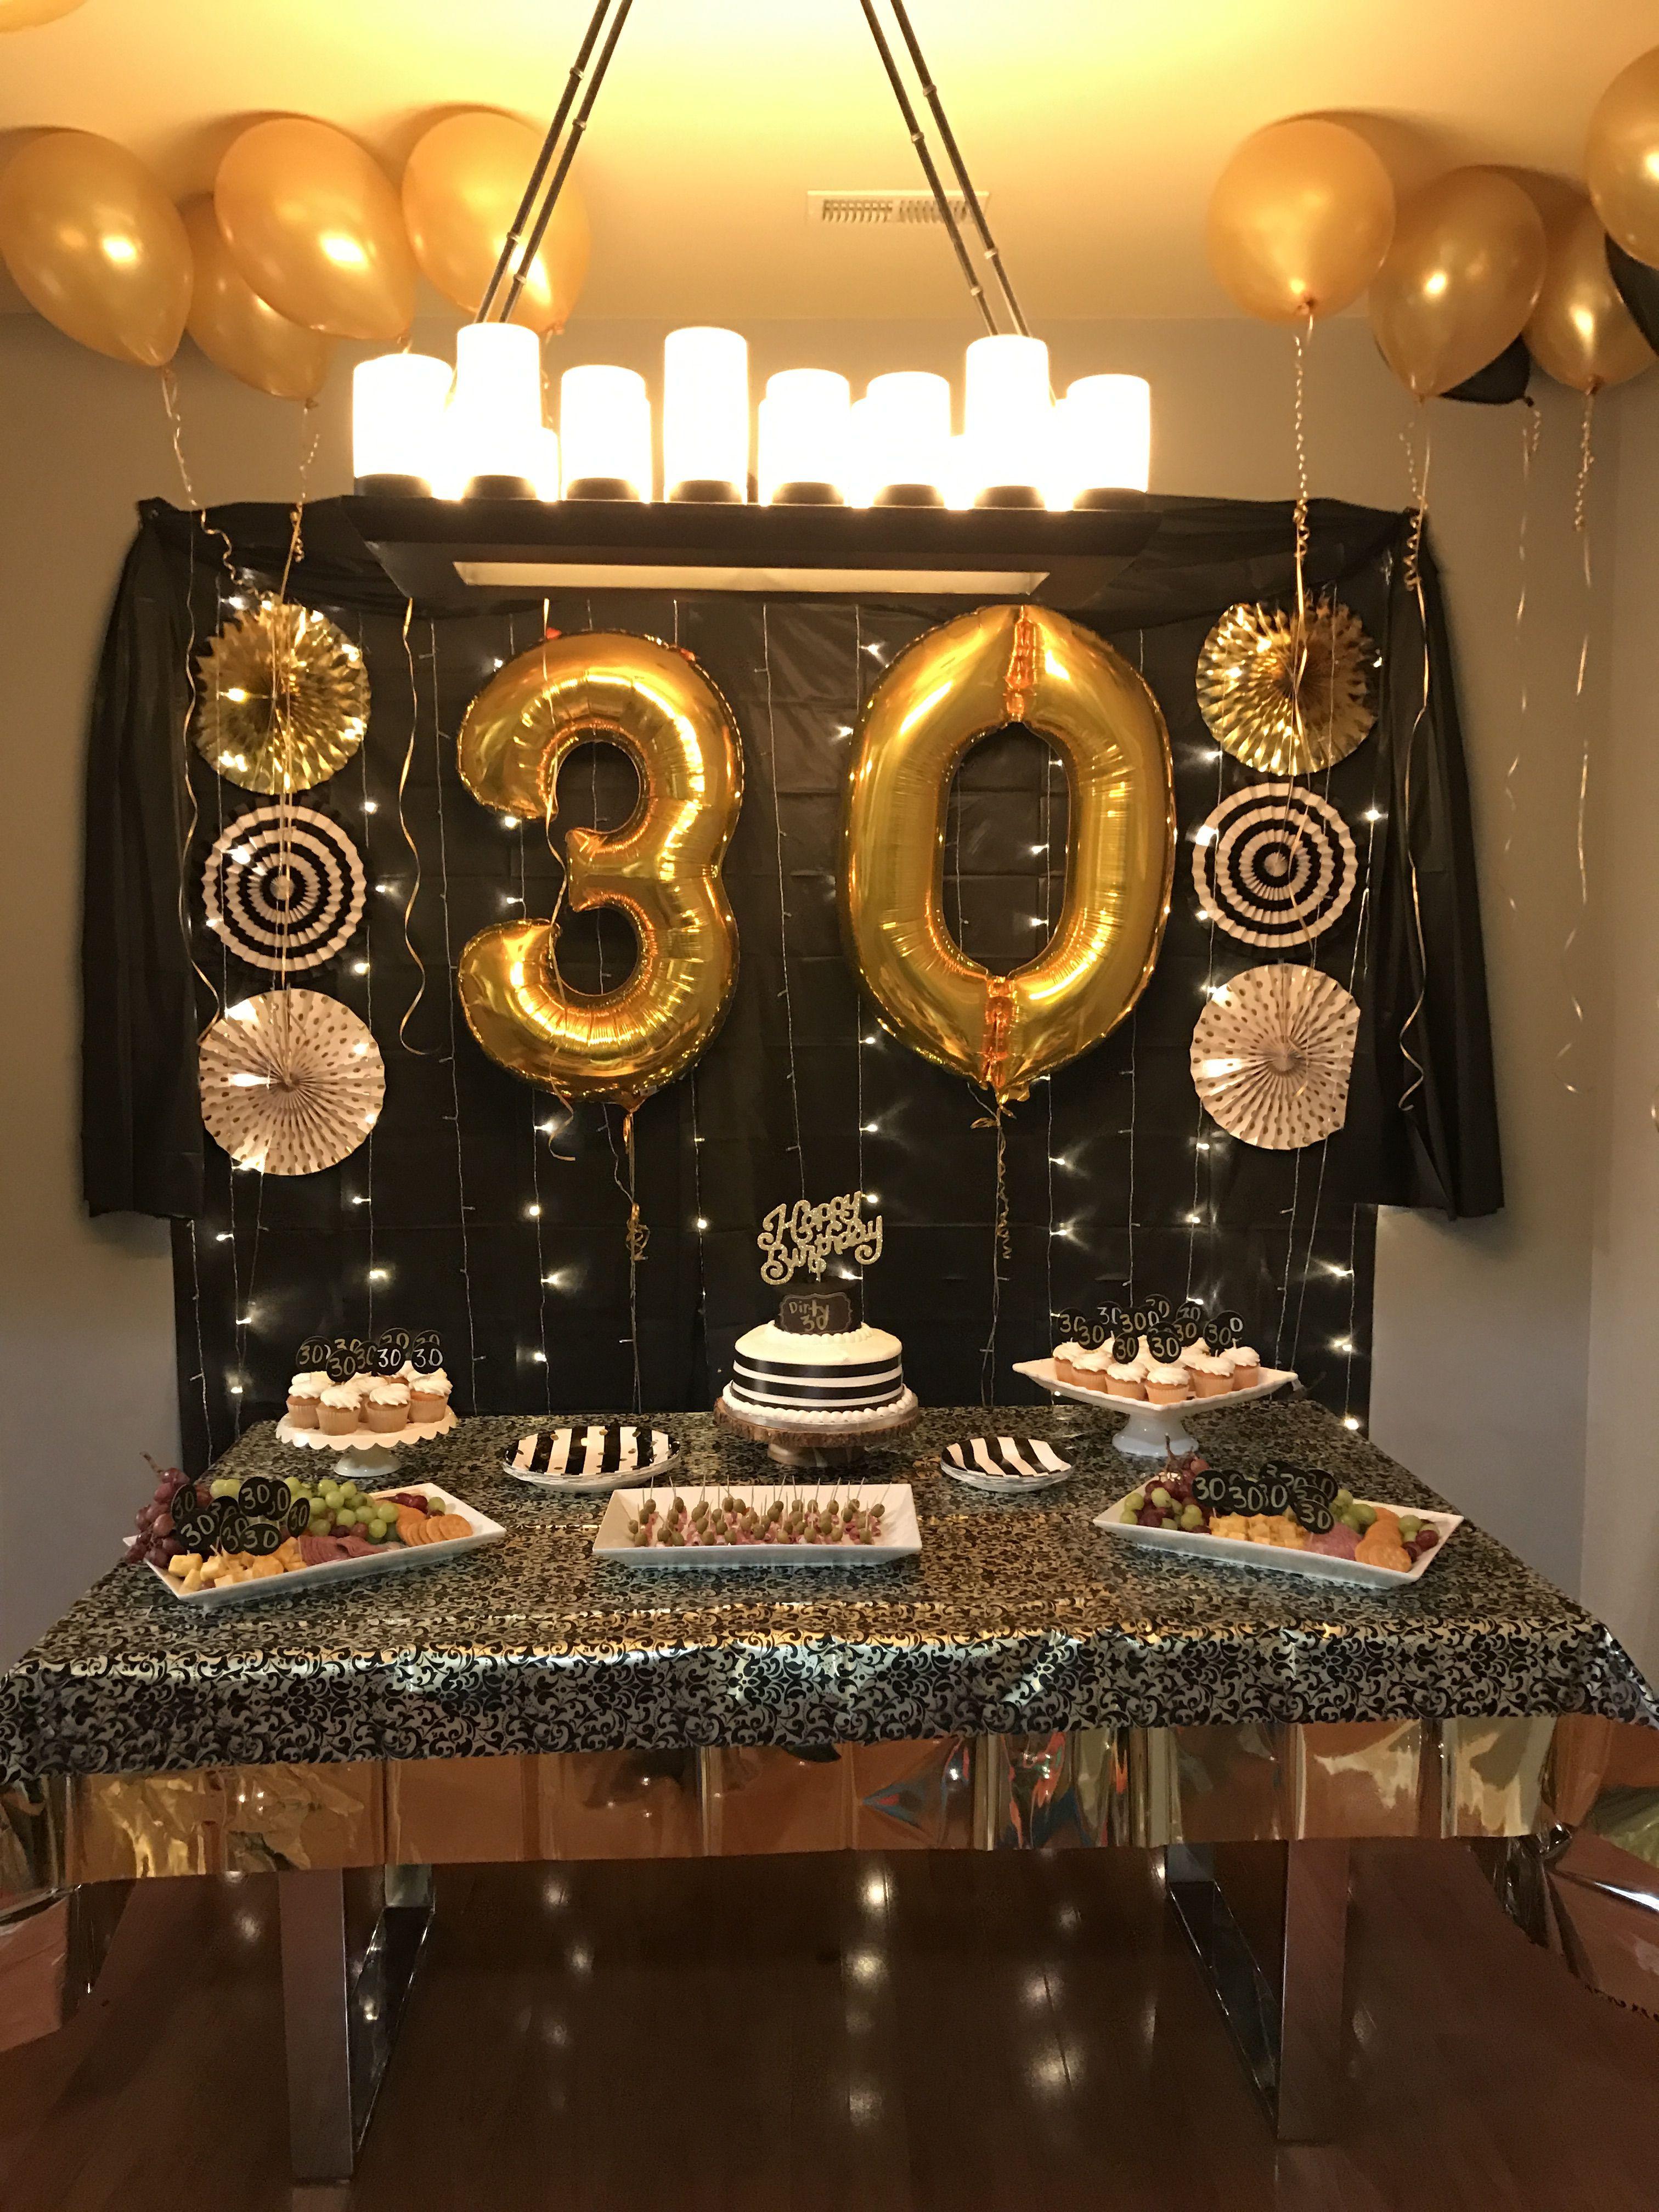 Pin by veronica pena on vero santiago geburtstag dekoration geburtstag 50 geburtstag - Geburtstagsideen zum 90 ...